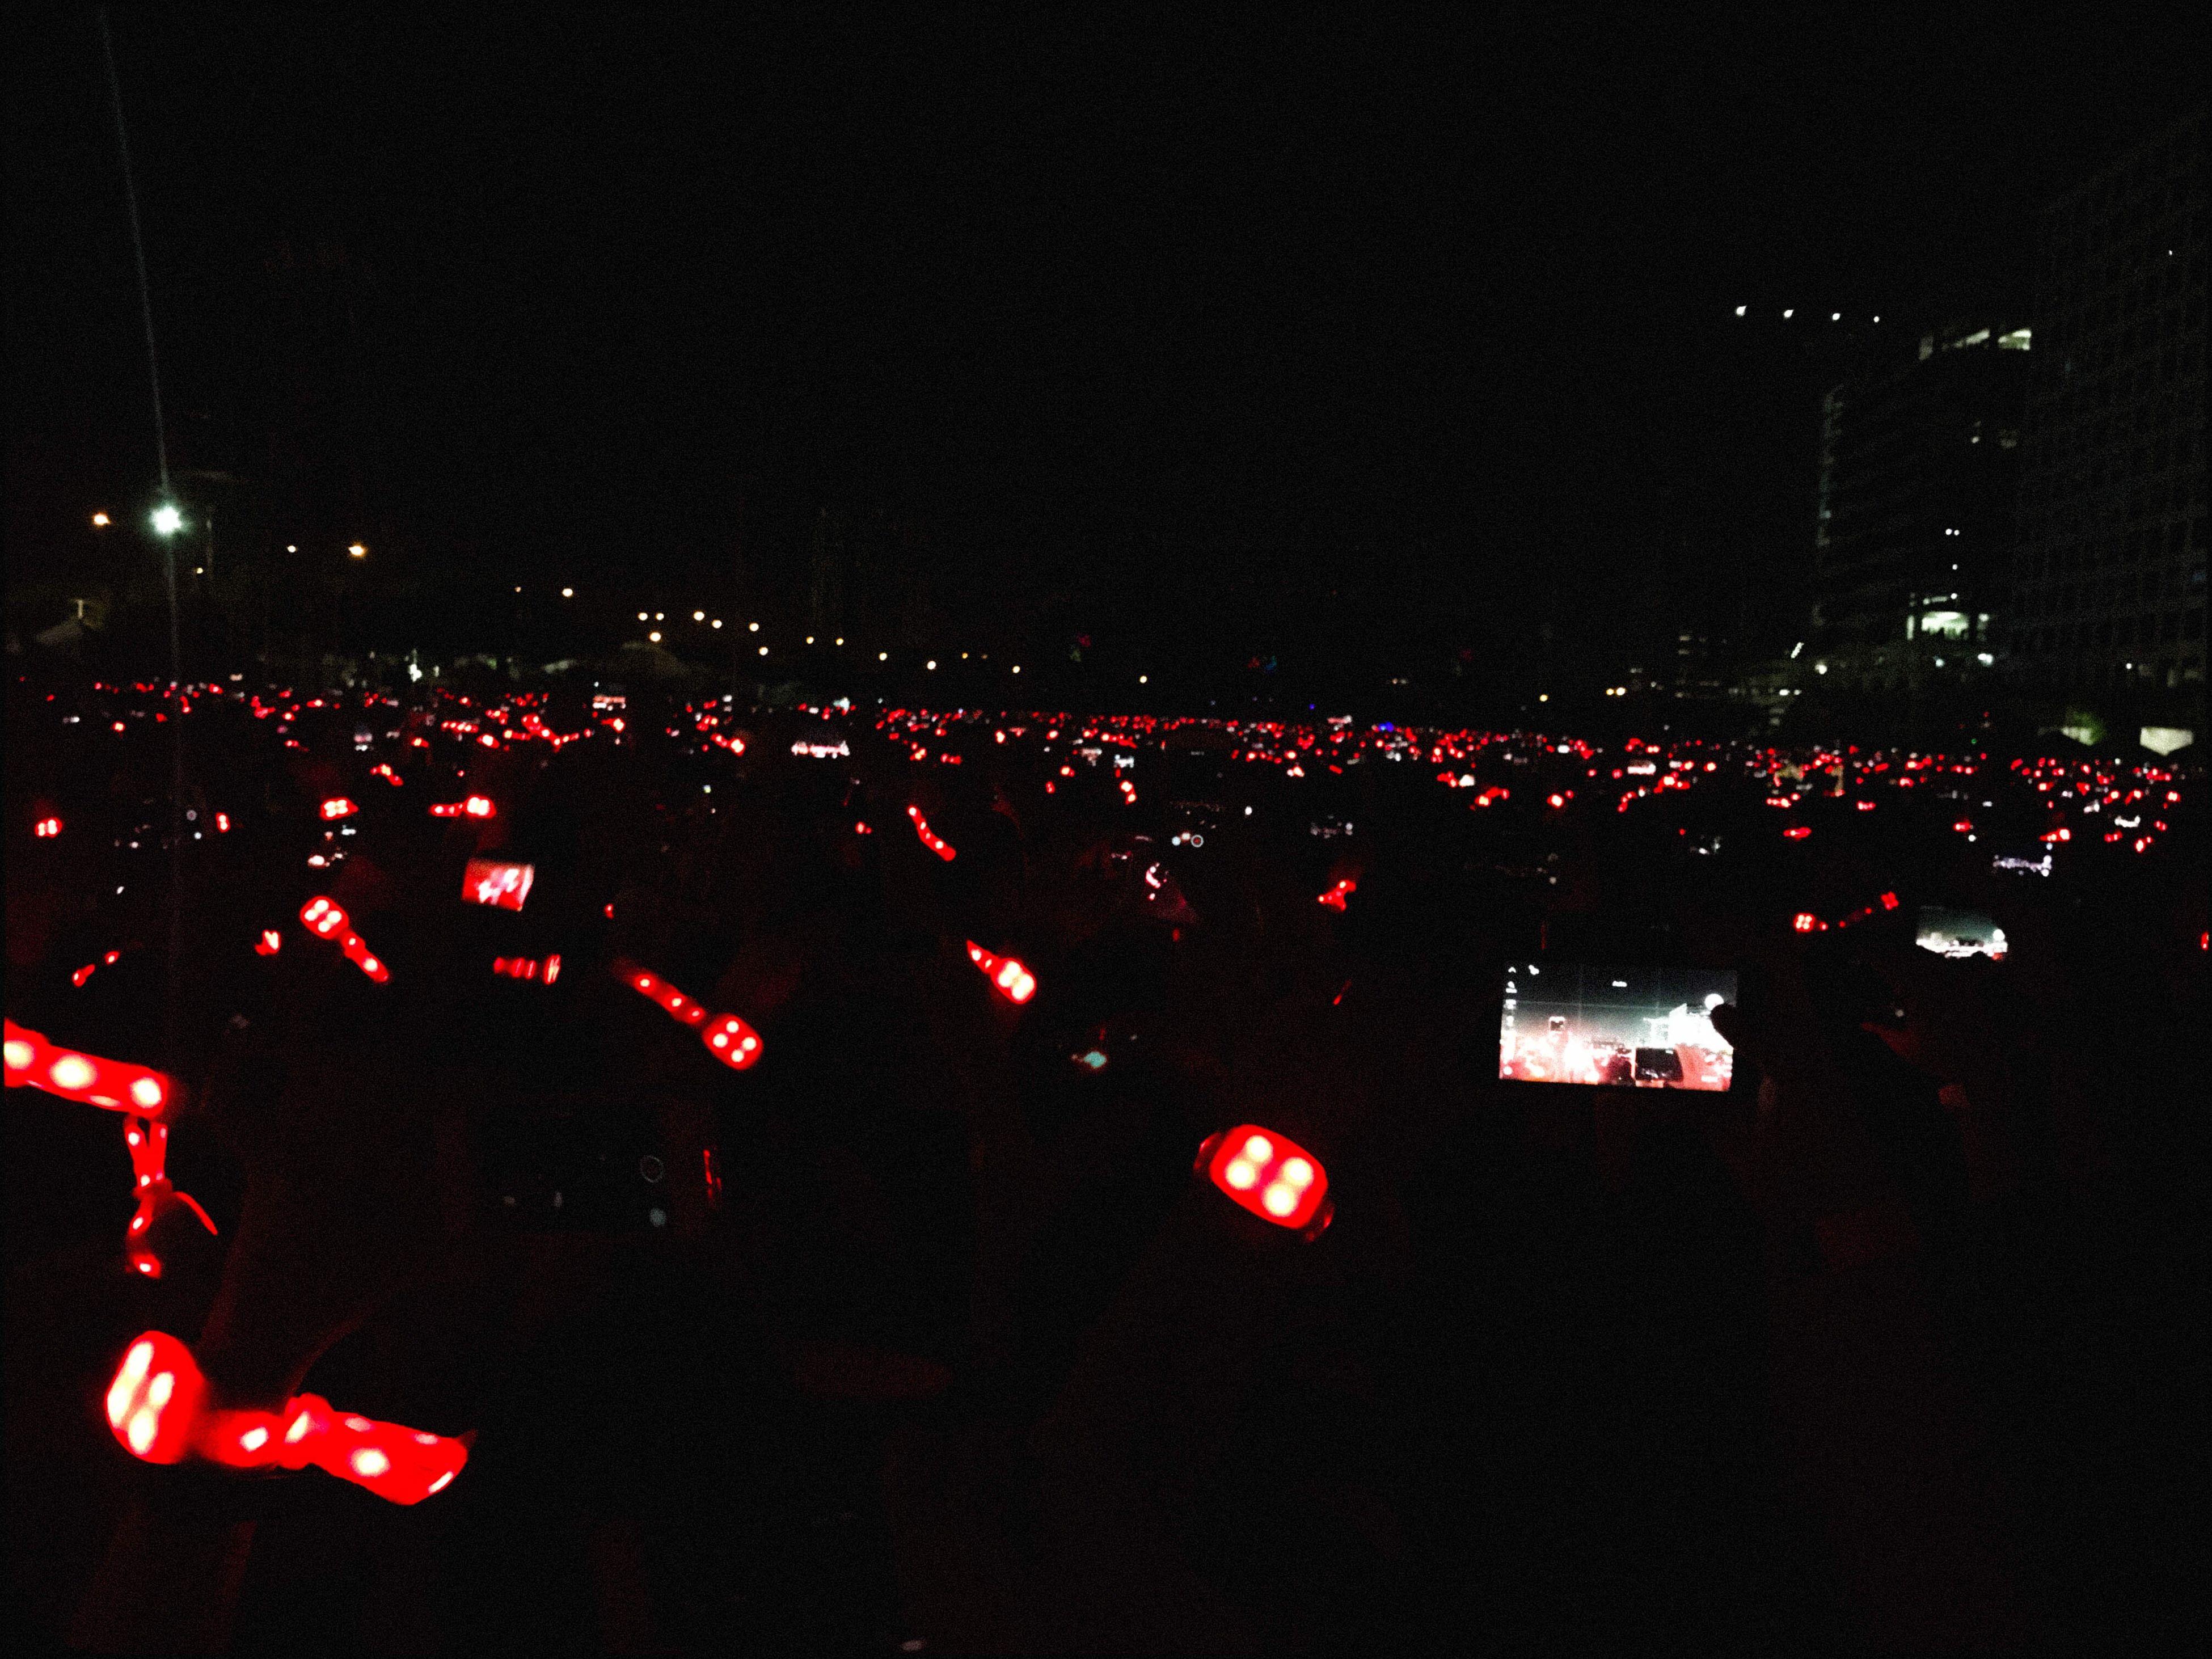 mode of transport, night, illuminated, transportation, red, sky, outdoors, no people